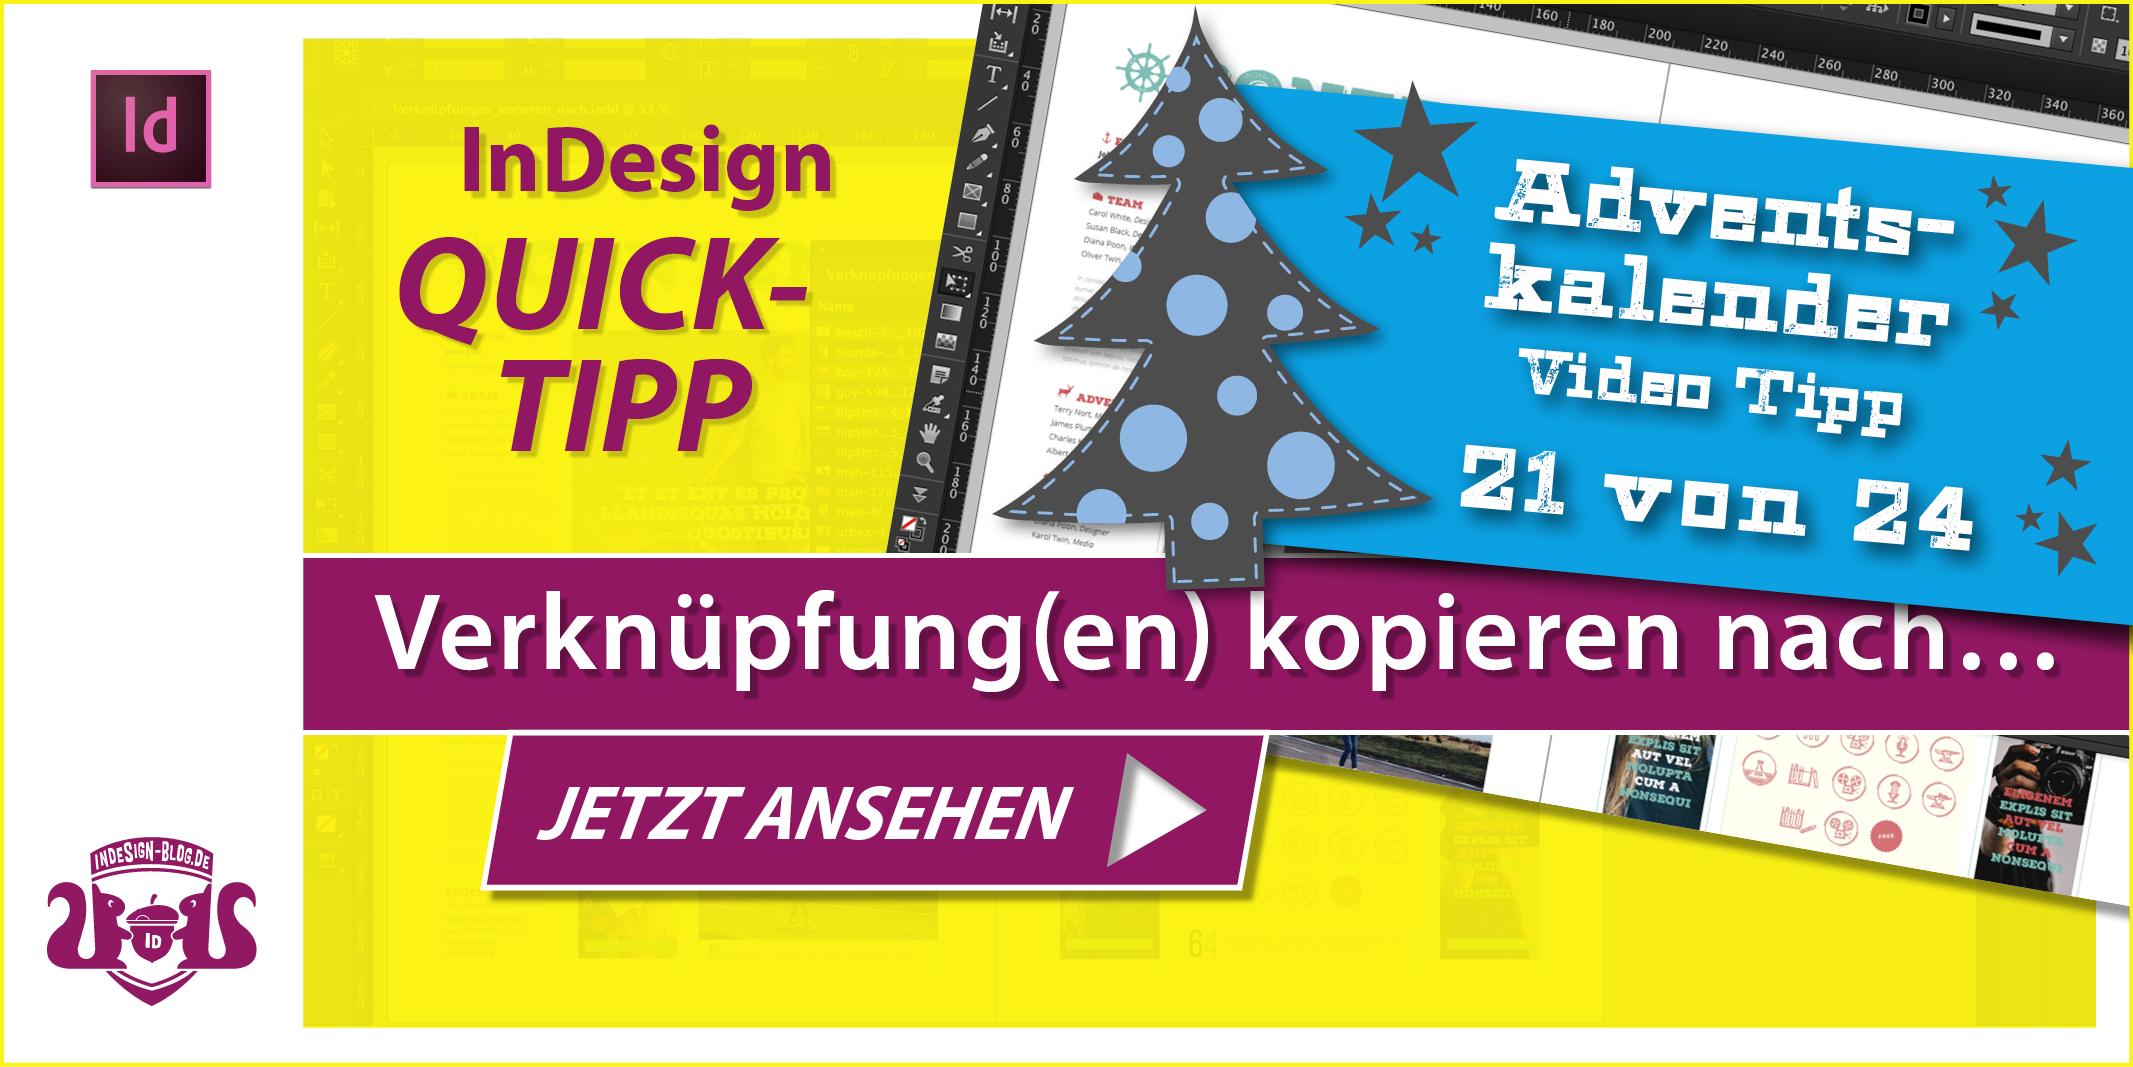 Thumbnail Quicktipp Verknüpfungen kopieren nach in InDesign